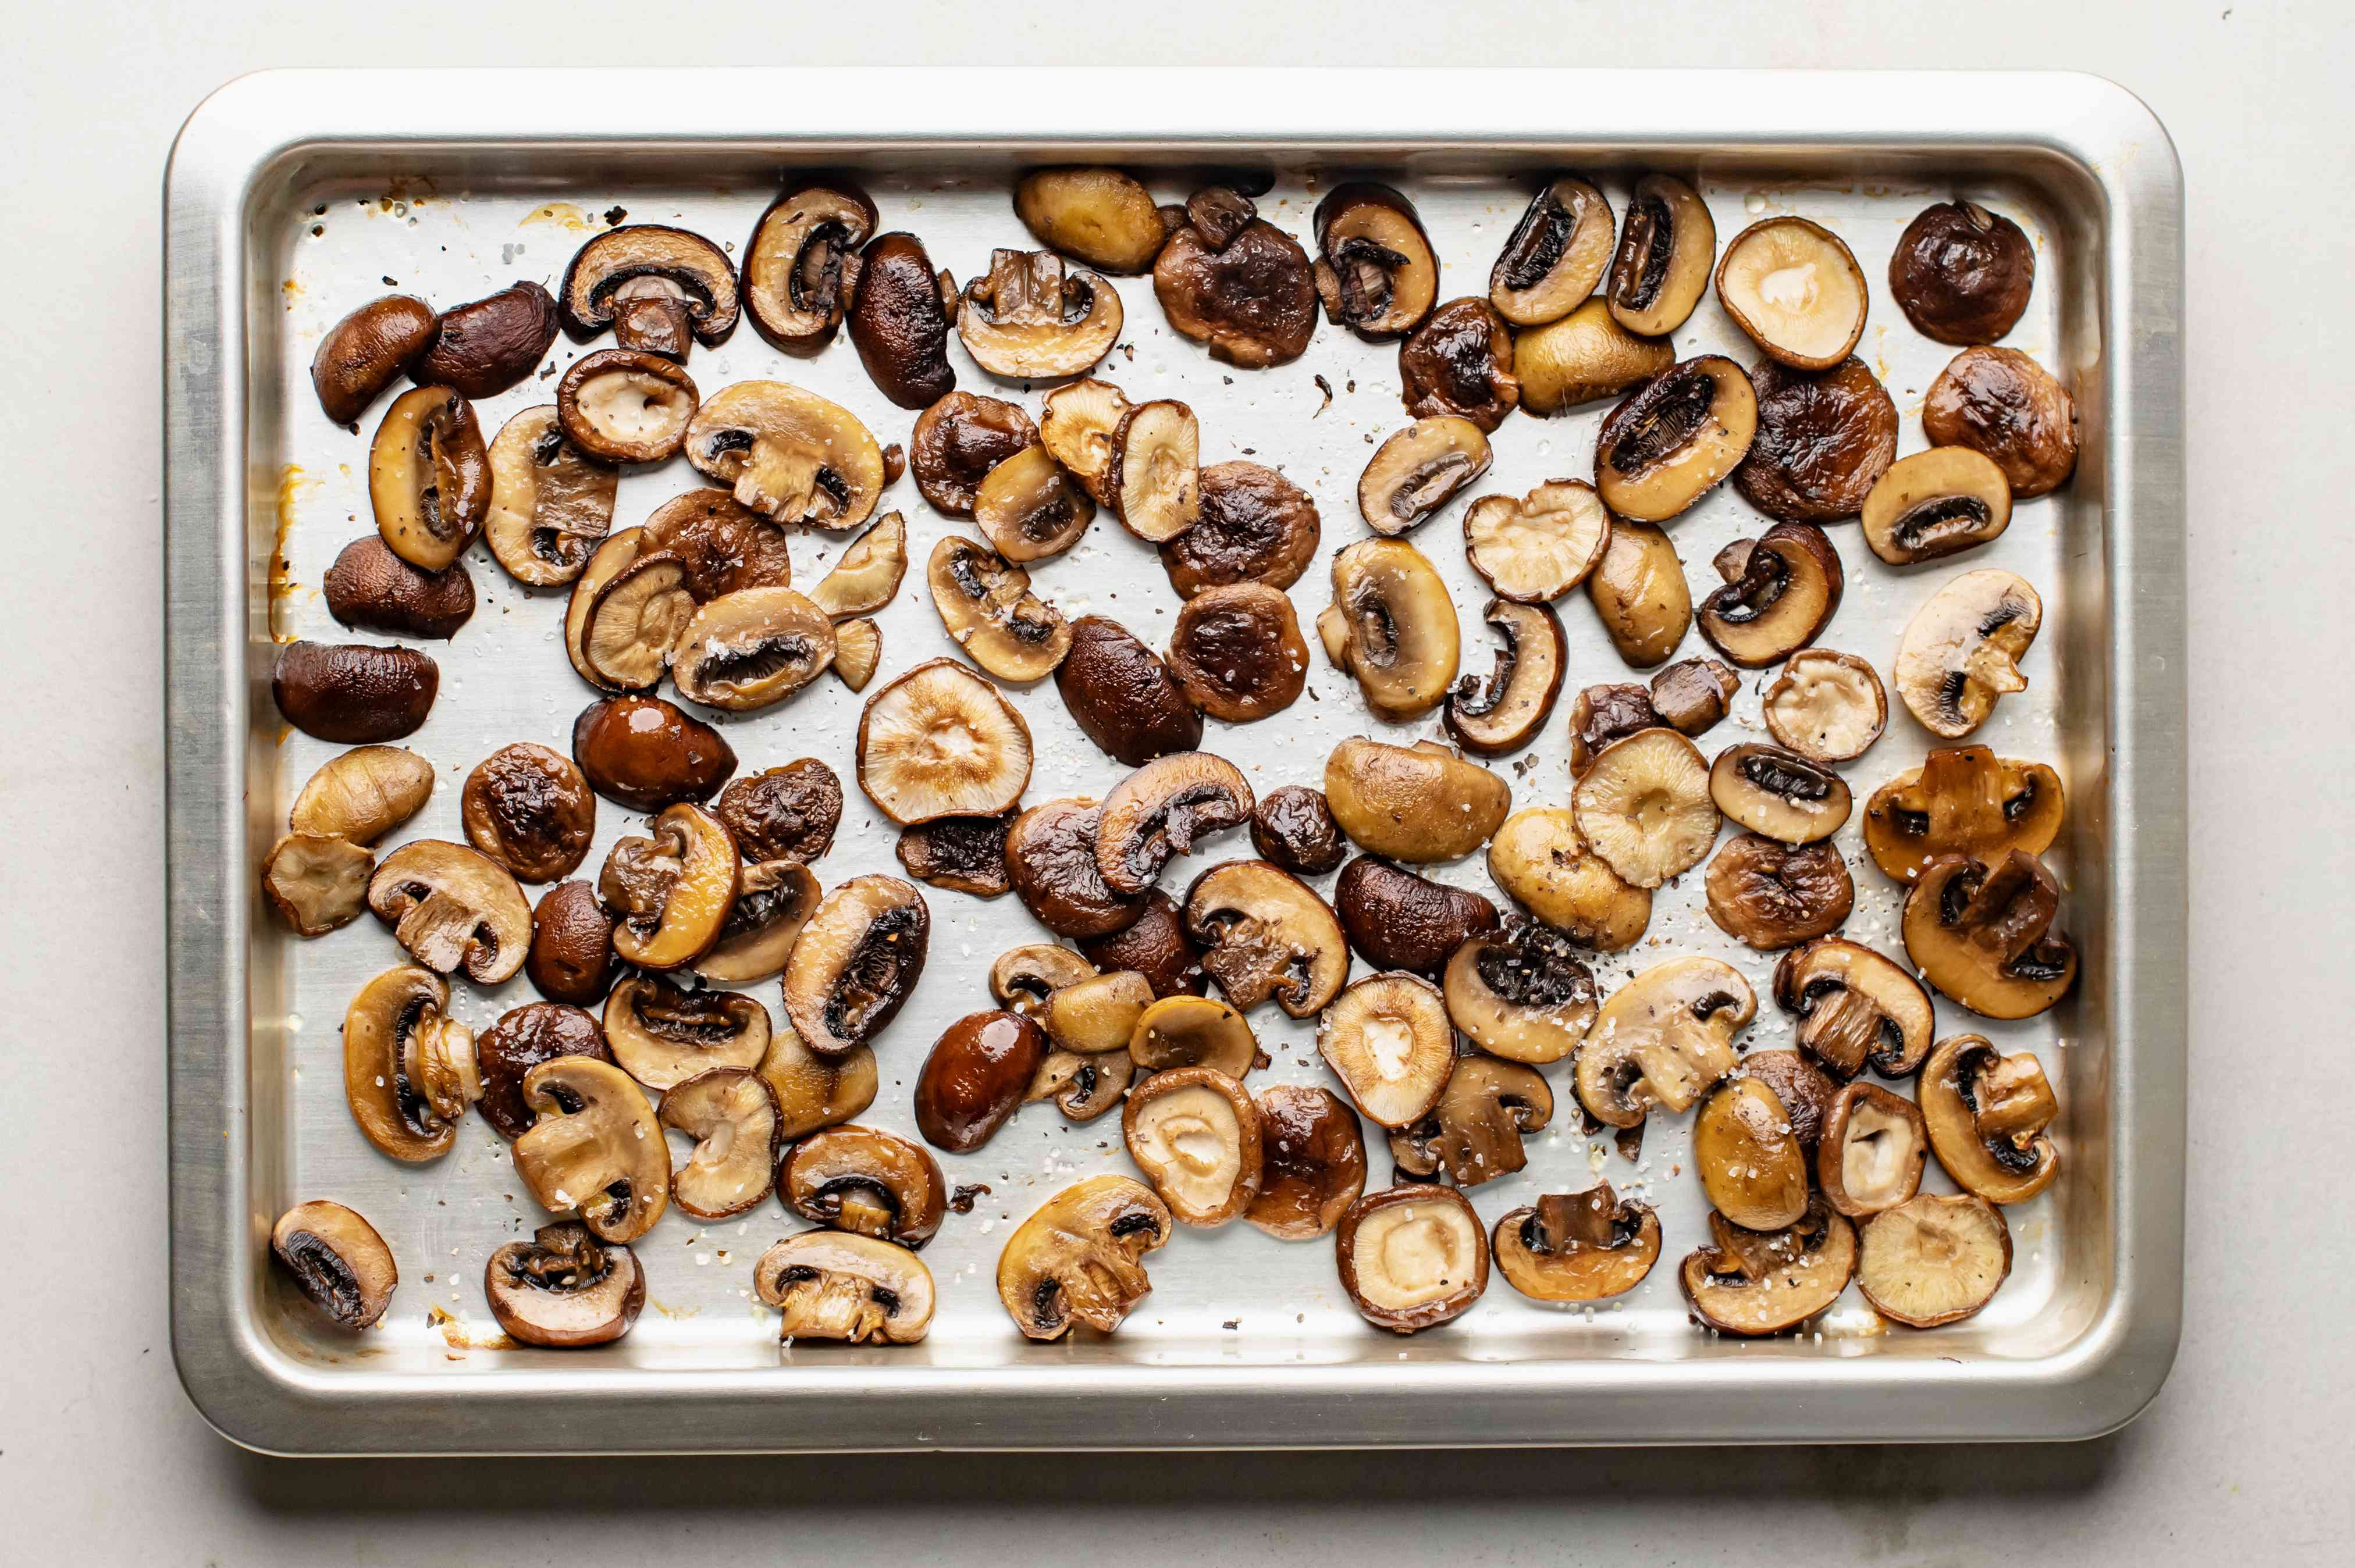 Toss mushrooms on baking tray